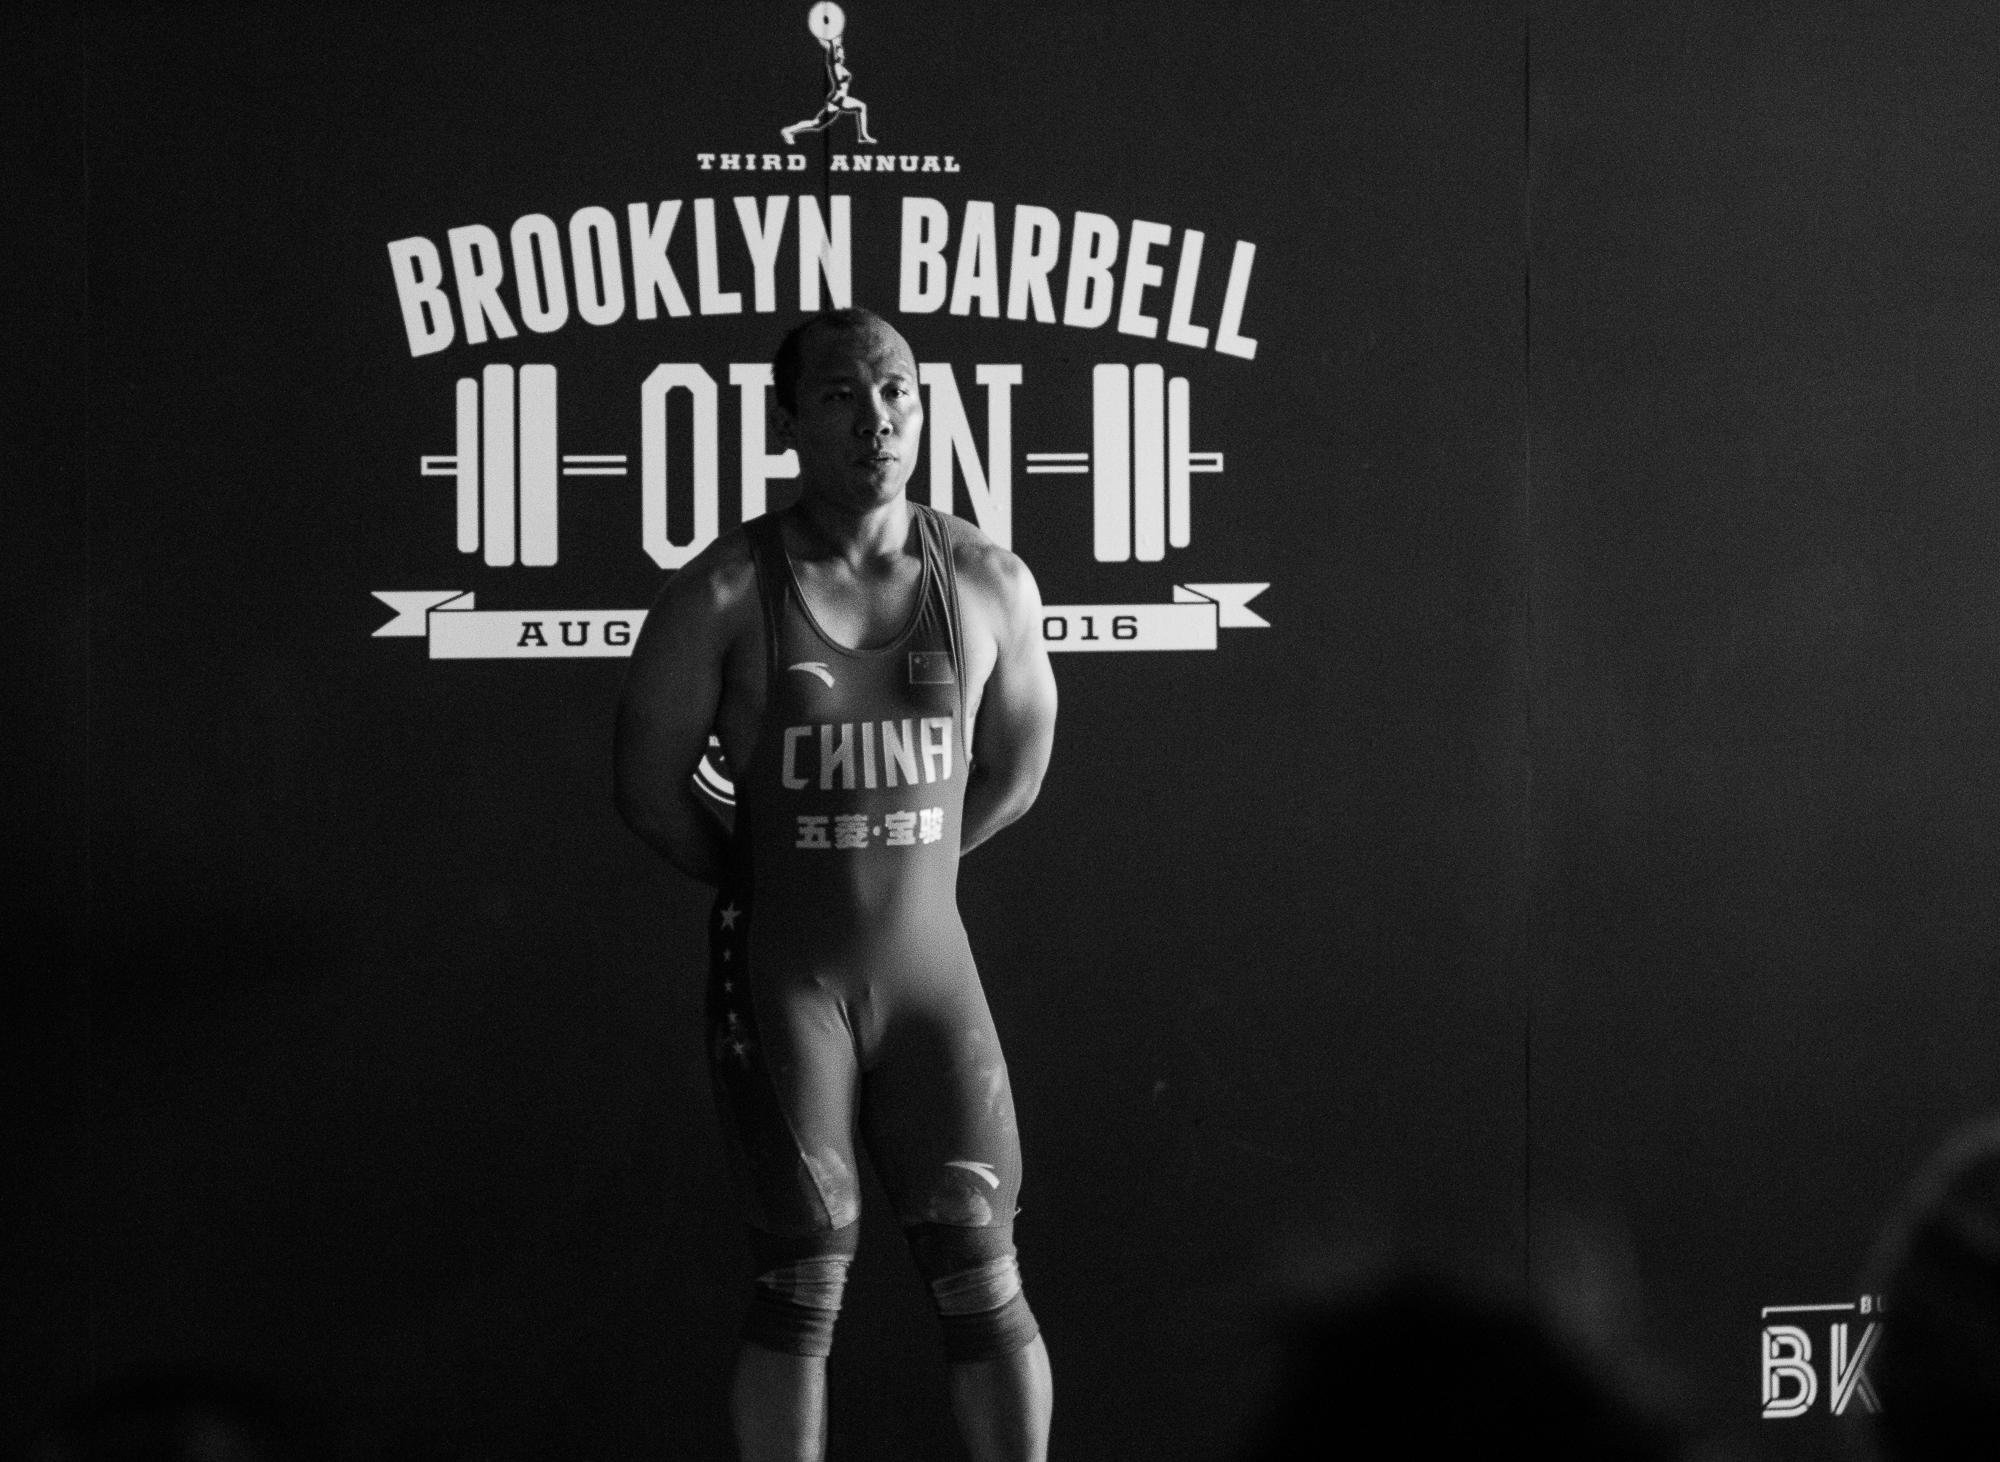 brooklyn-barbell-open-august-2016-everyday-ifters-vp (14 of 19).jpg